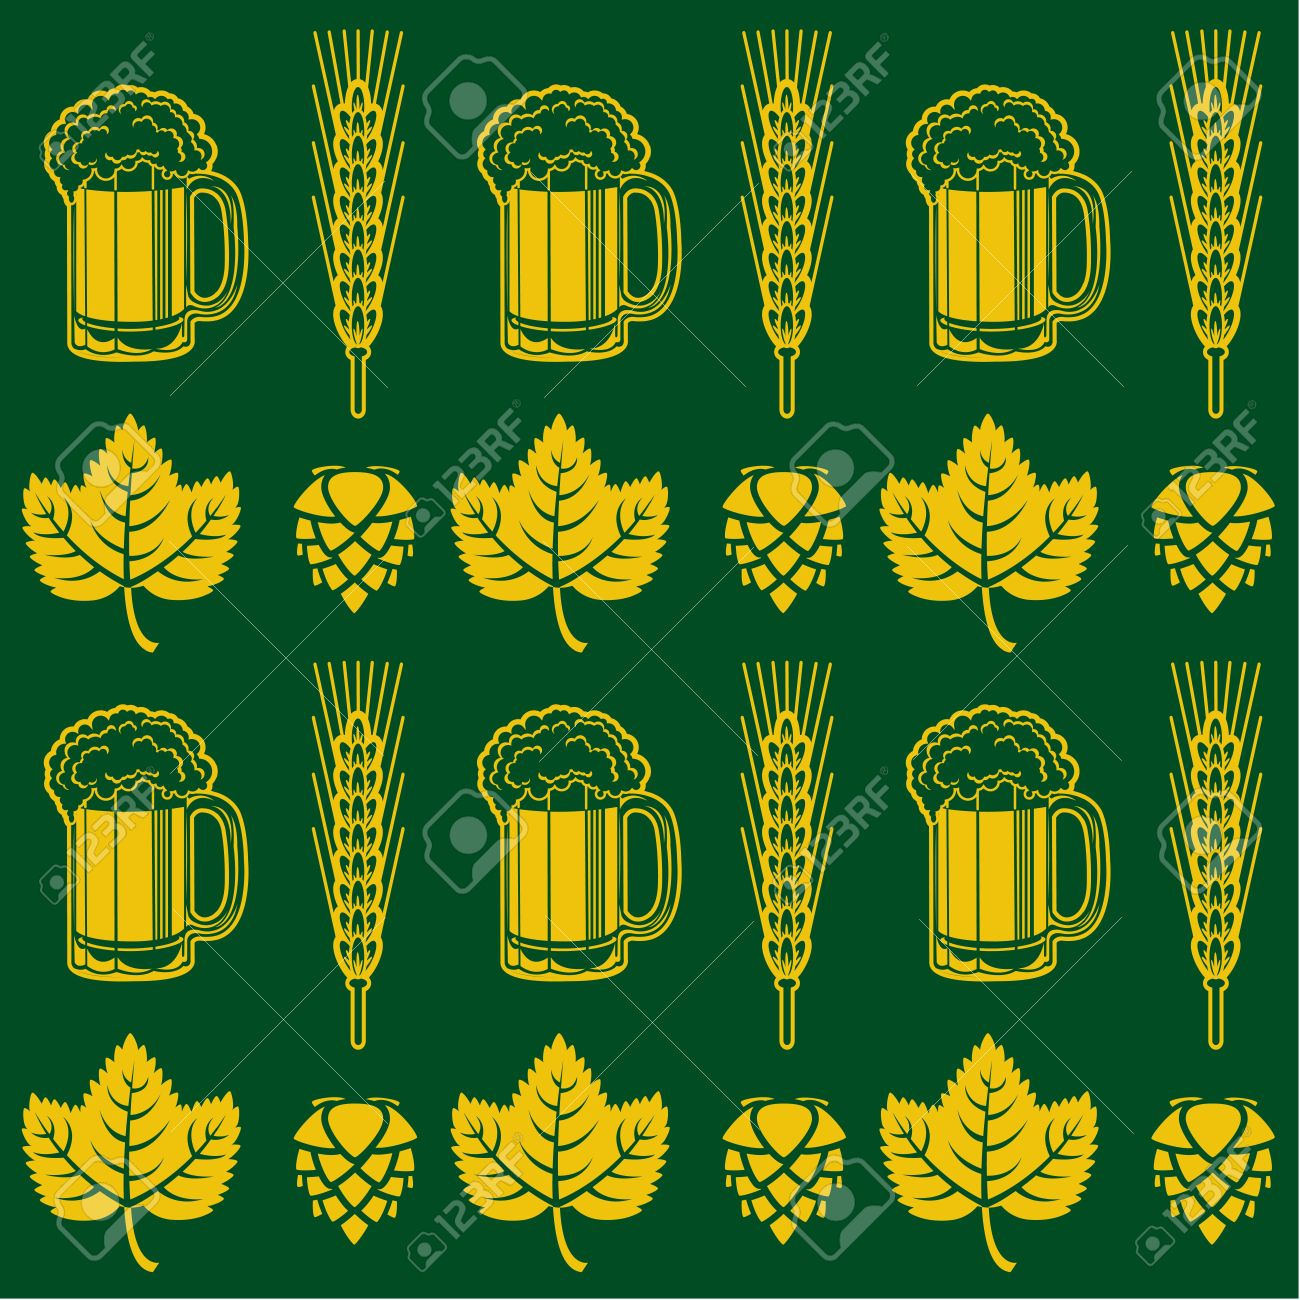 Beer Seamless Pattern Stock Vector - 18515745